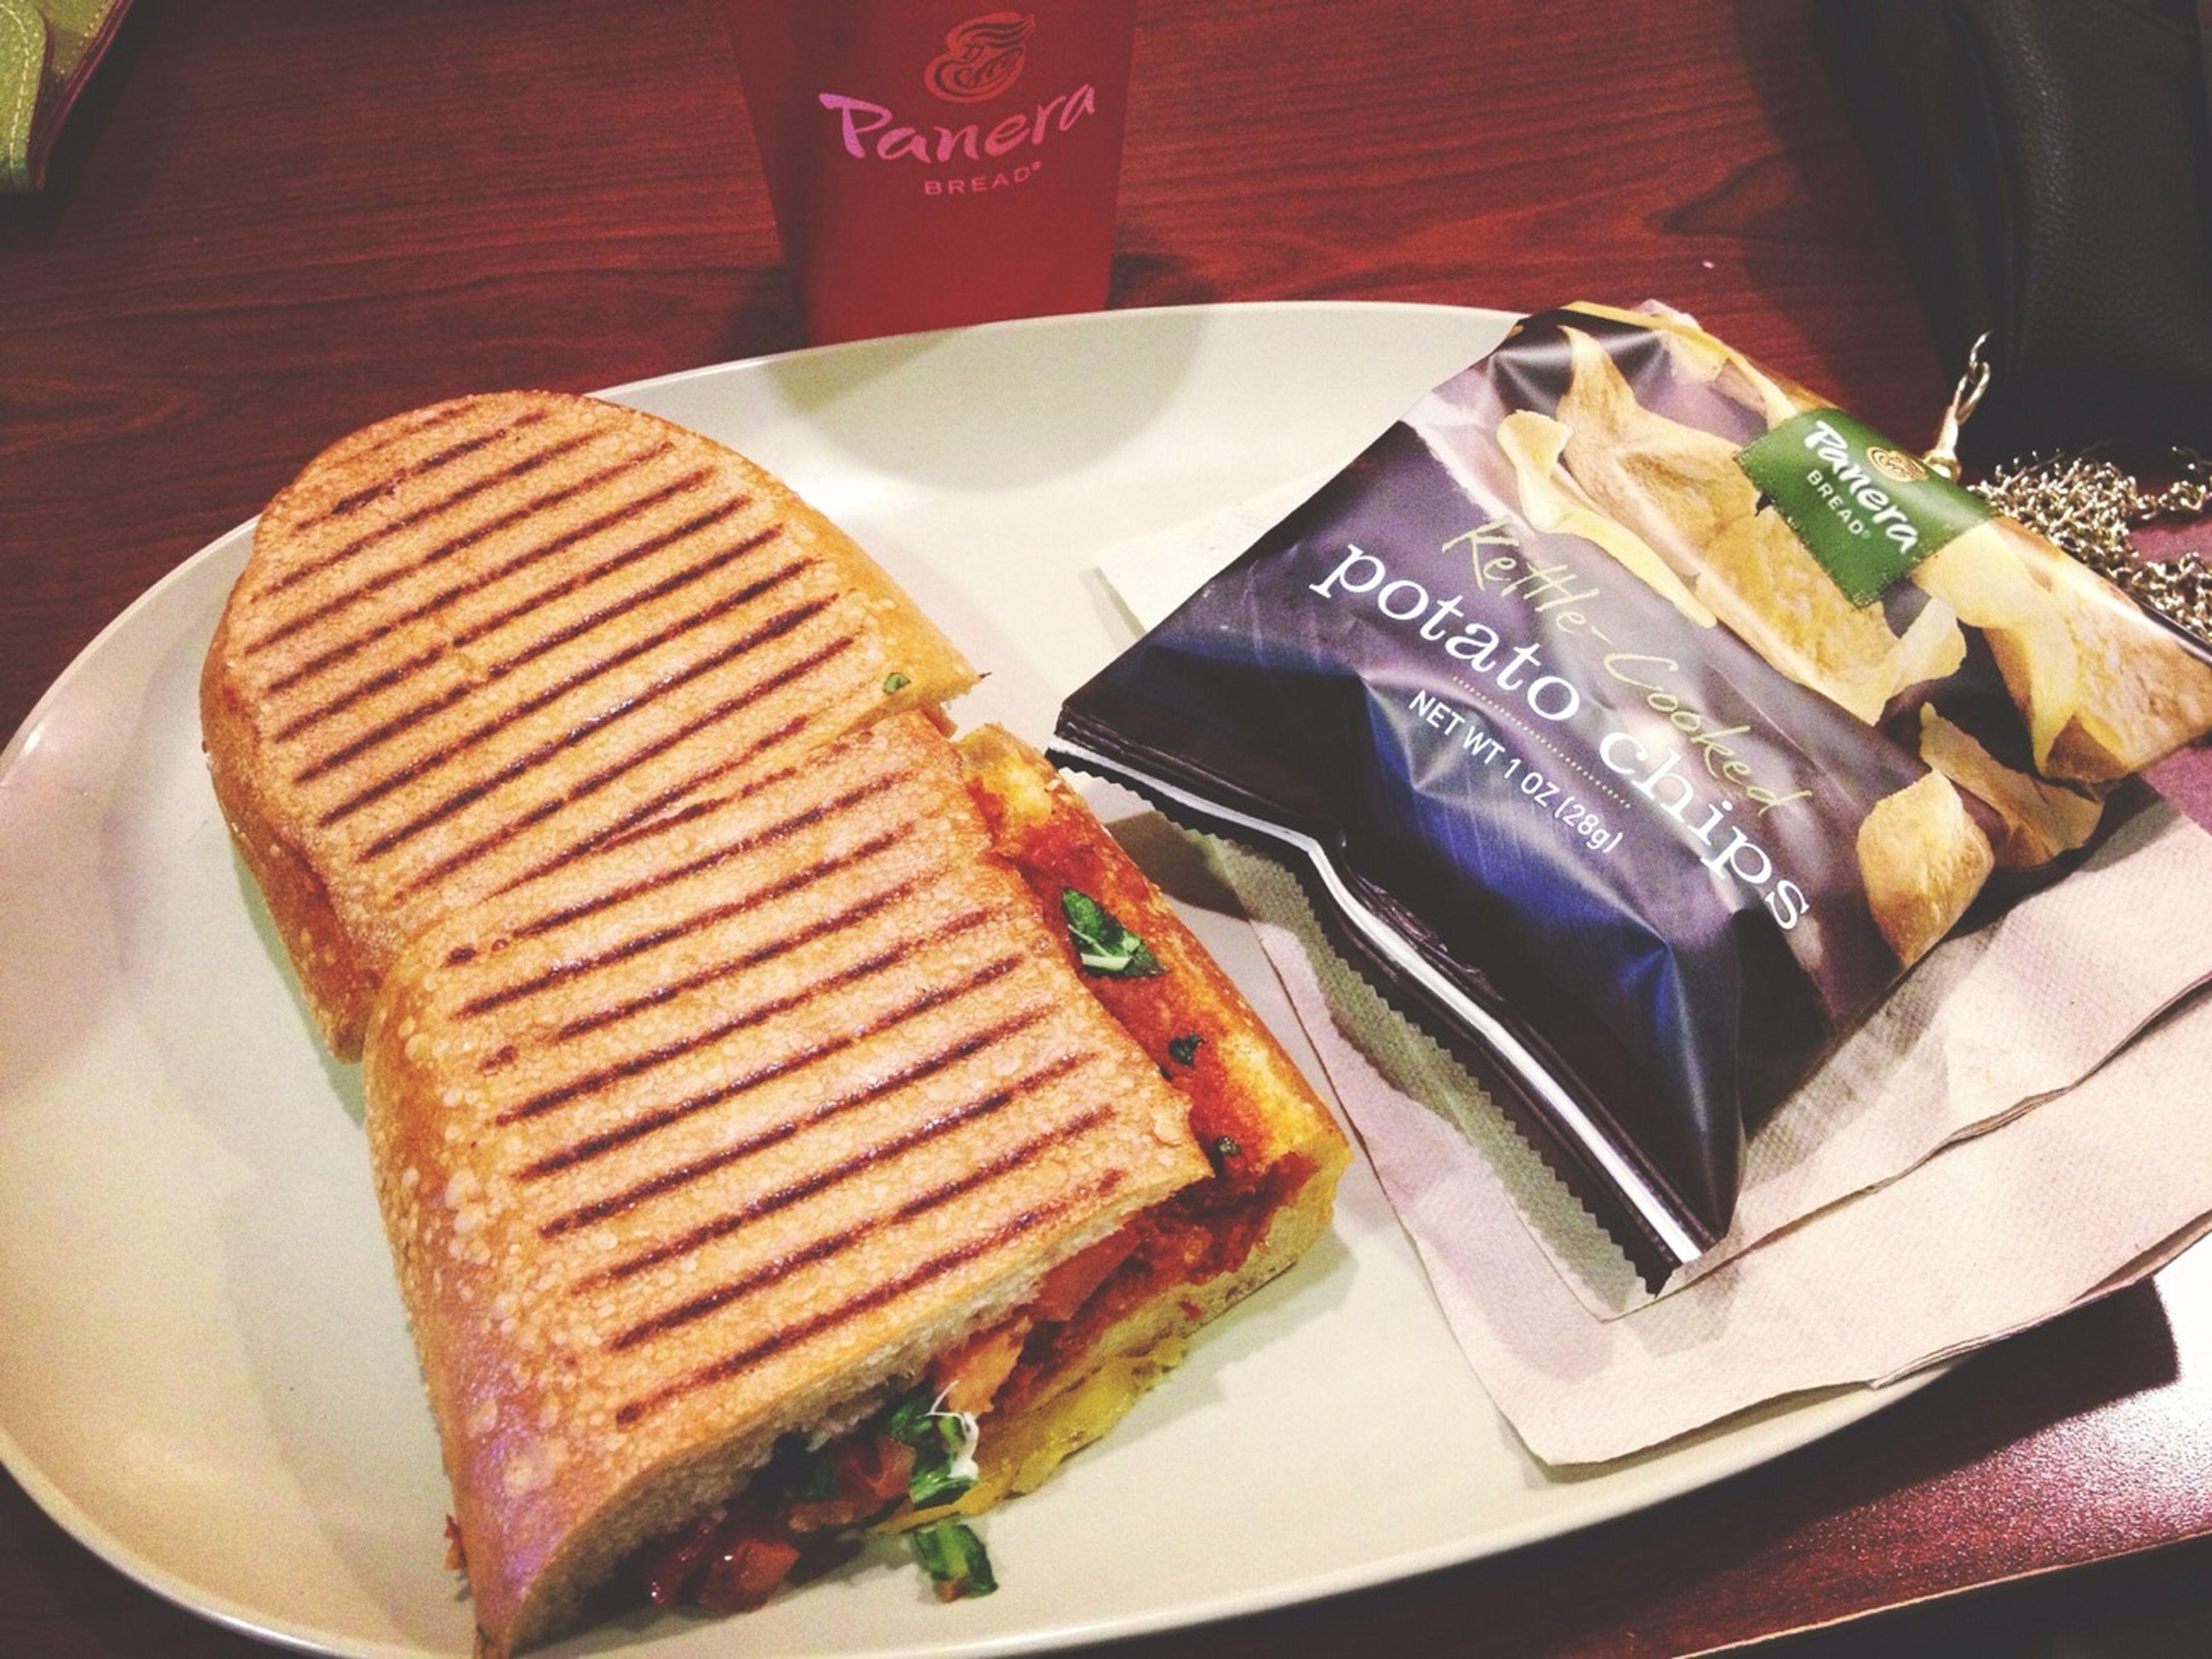 Tomato & mozzarella panini